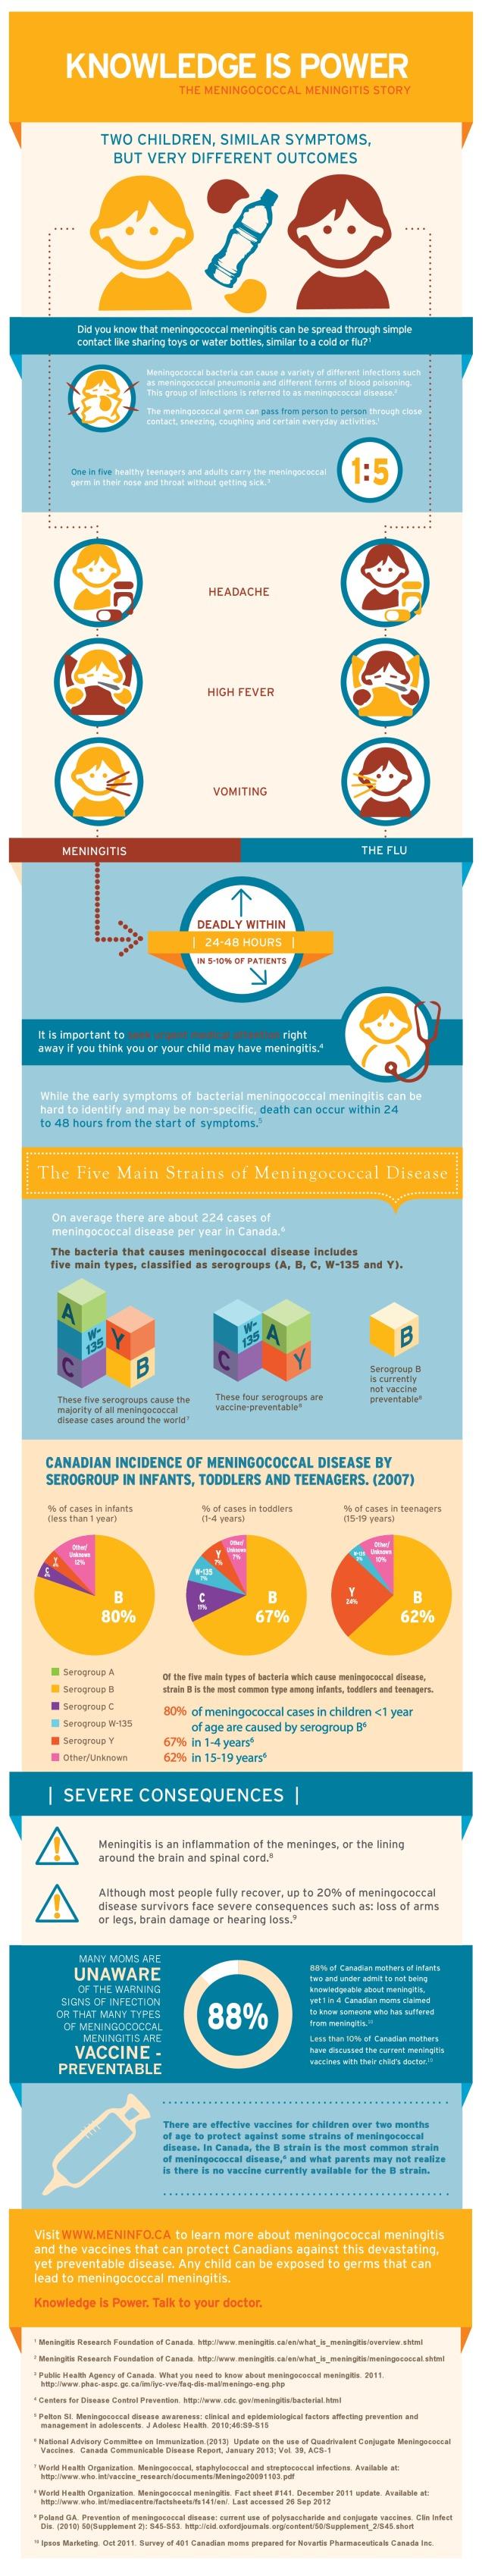 The Meningitis Story infographic